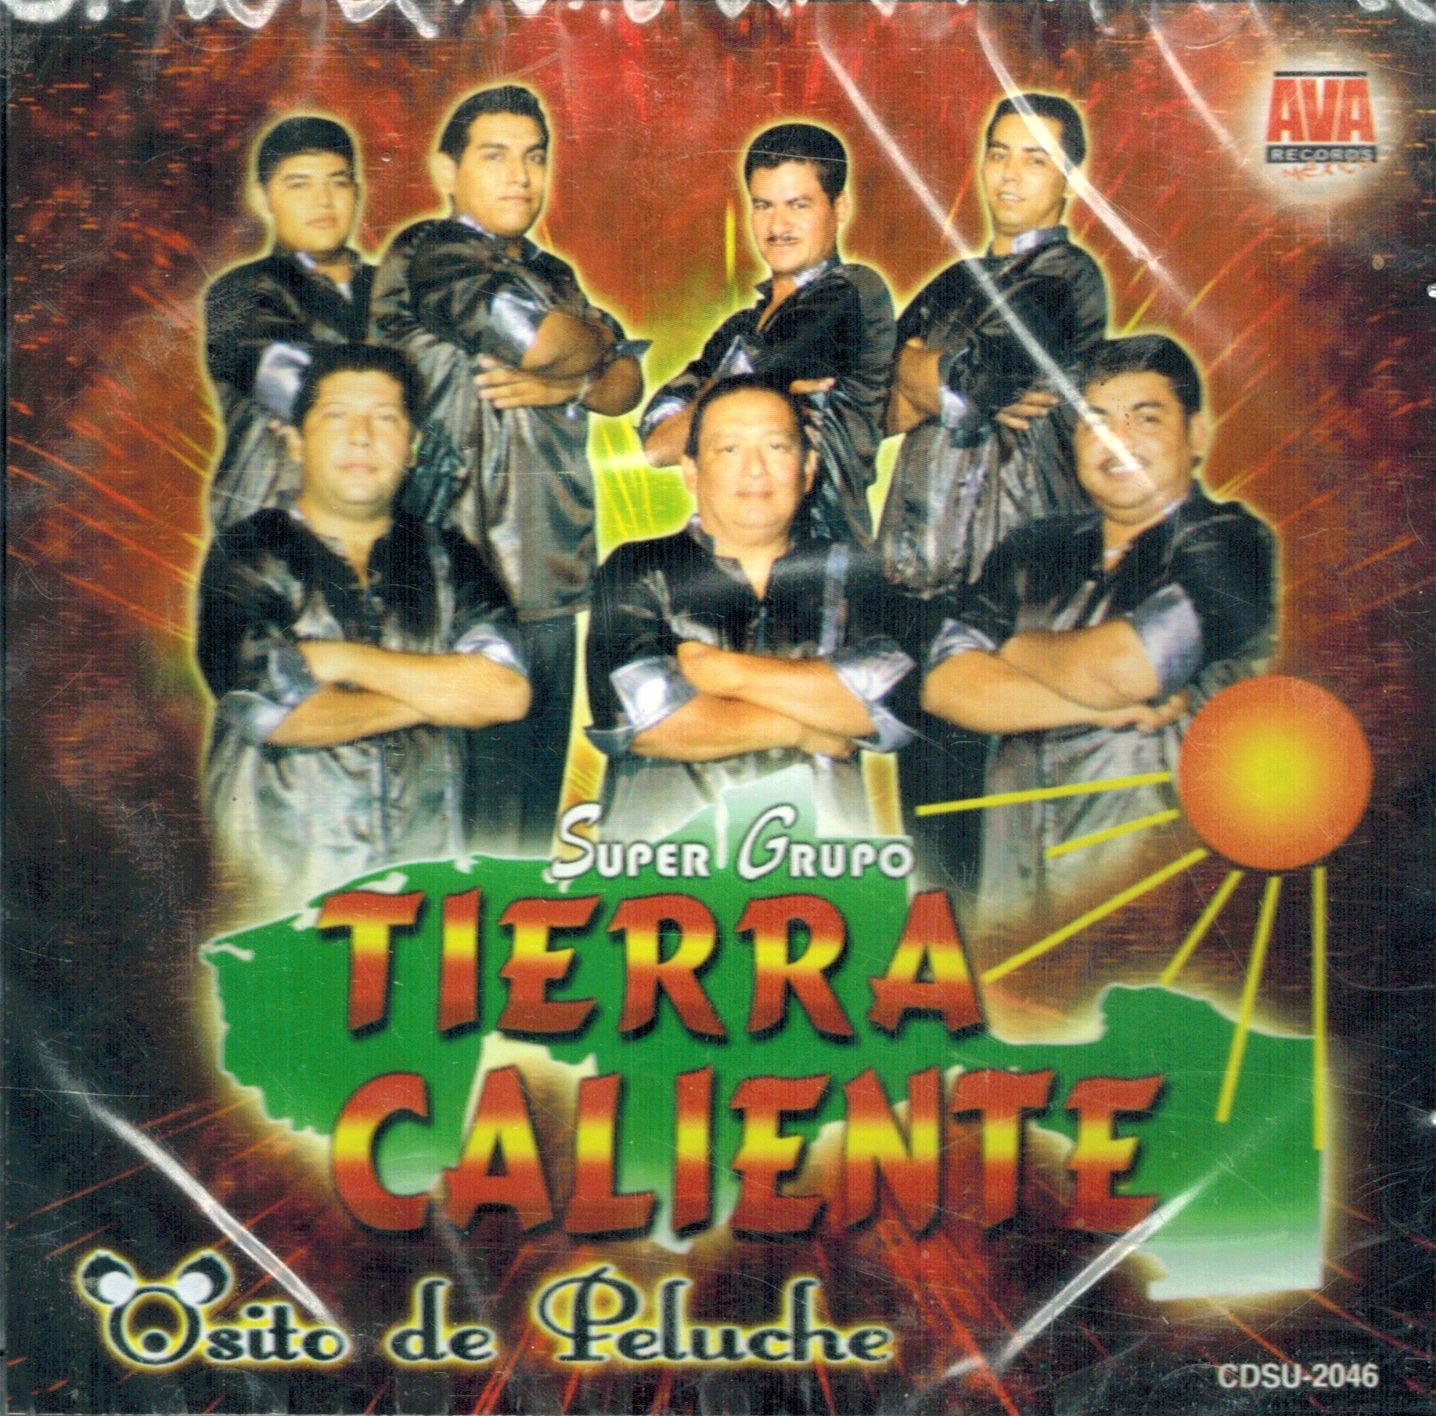 Super Grupo Tierra Caliente (Osito de Peluche)